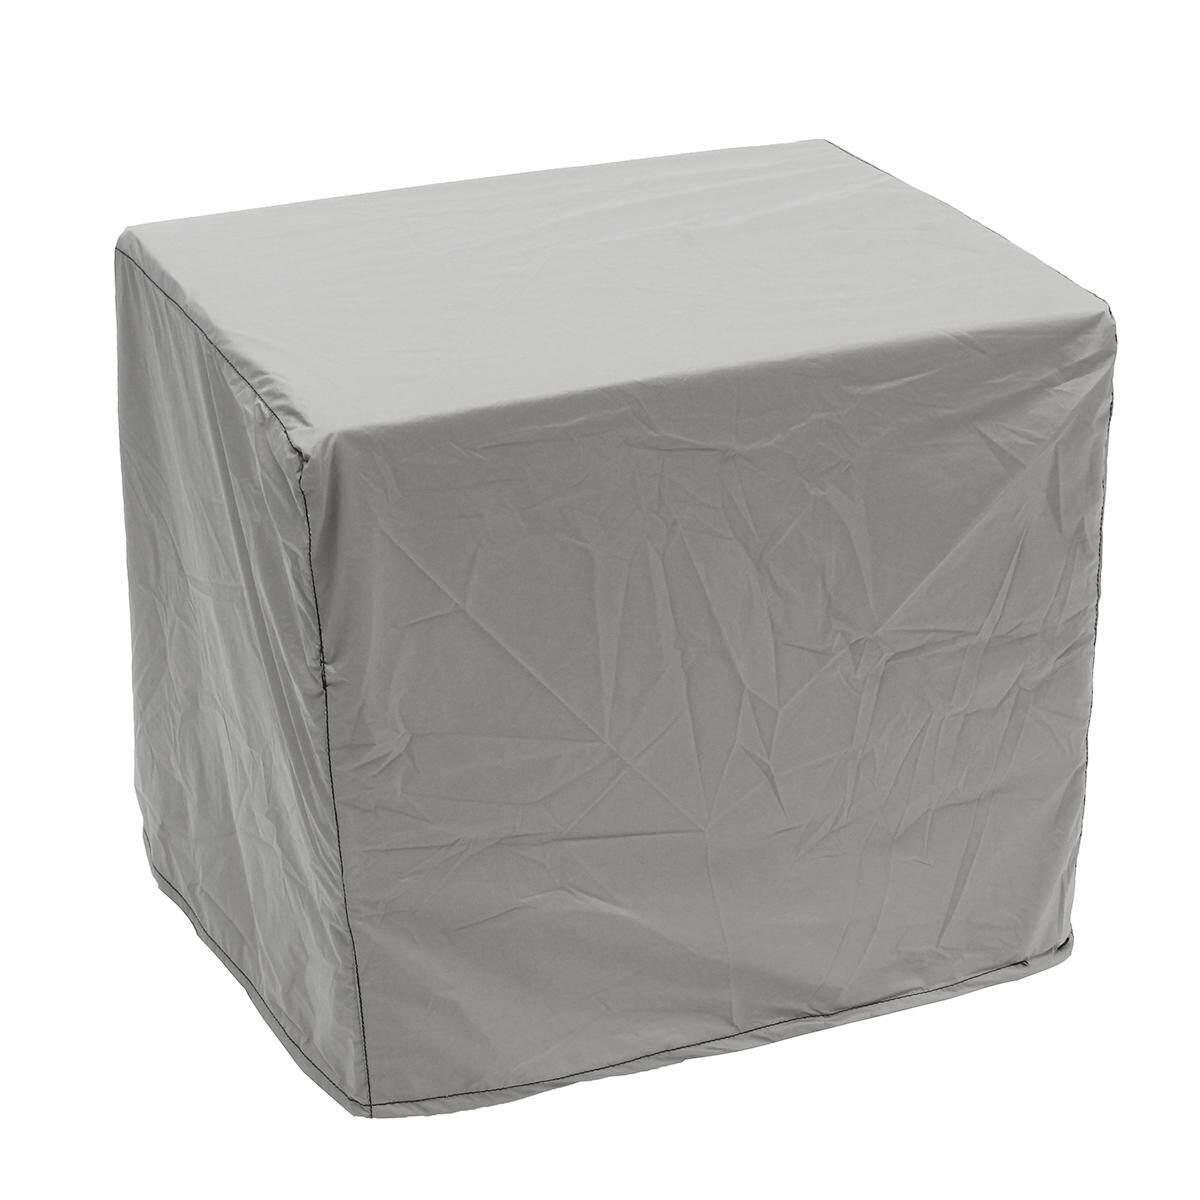 FreePost; OCO059 45 cm dia; Area Heater Cover; Black